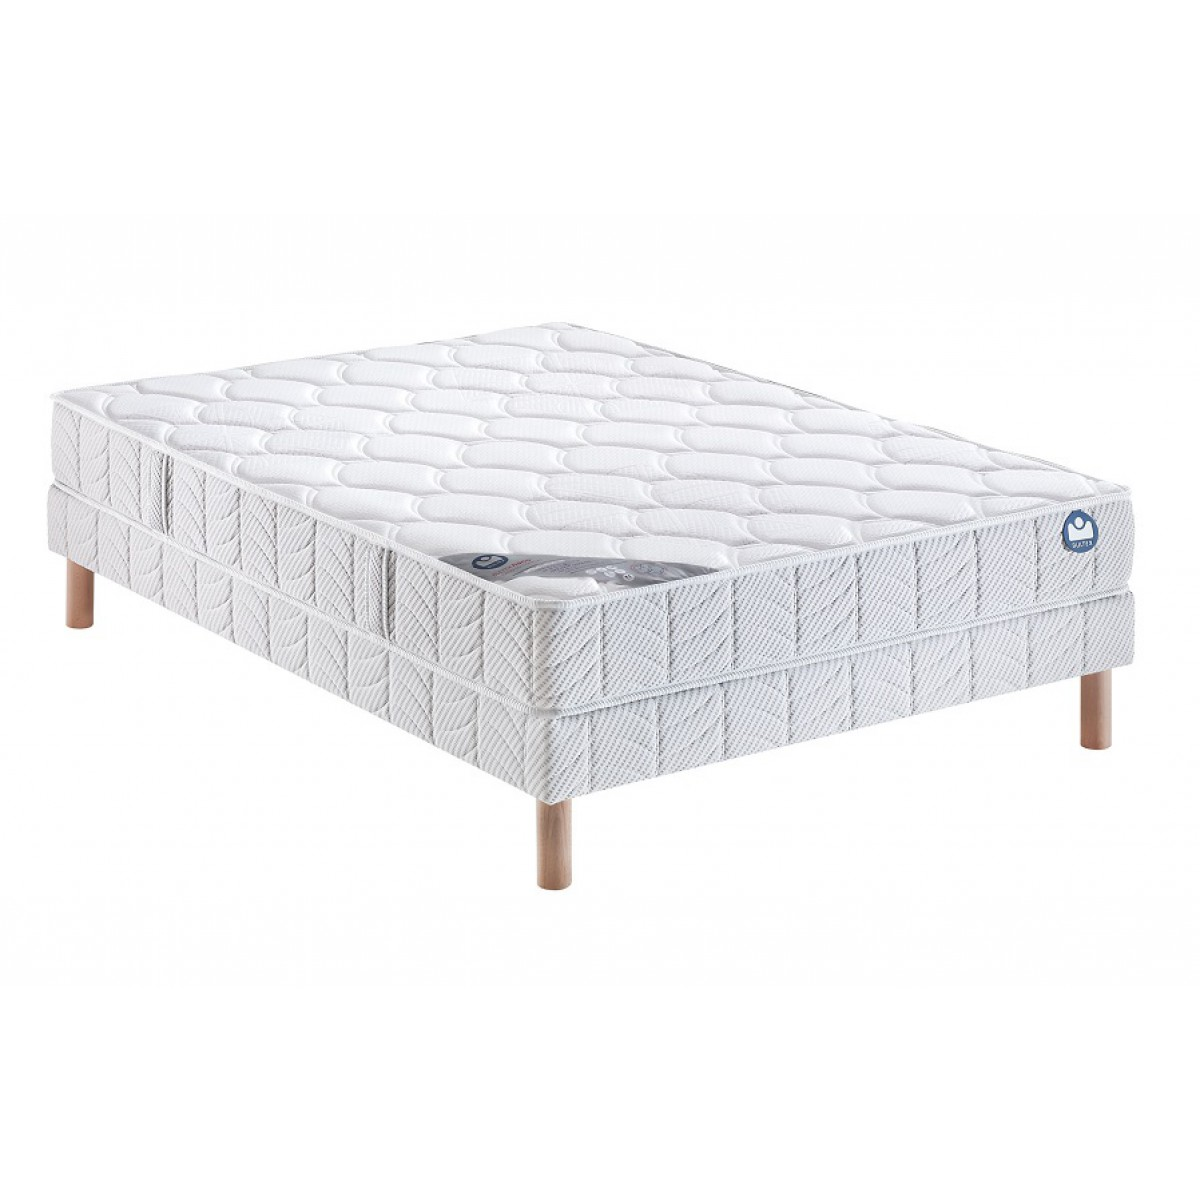 bultex censemble nano i novo 120 140x190. Black Bedroom Furniture Sets. Home Design Ideas